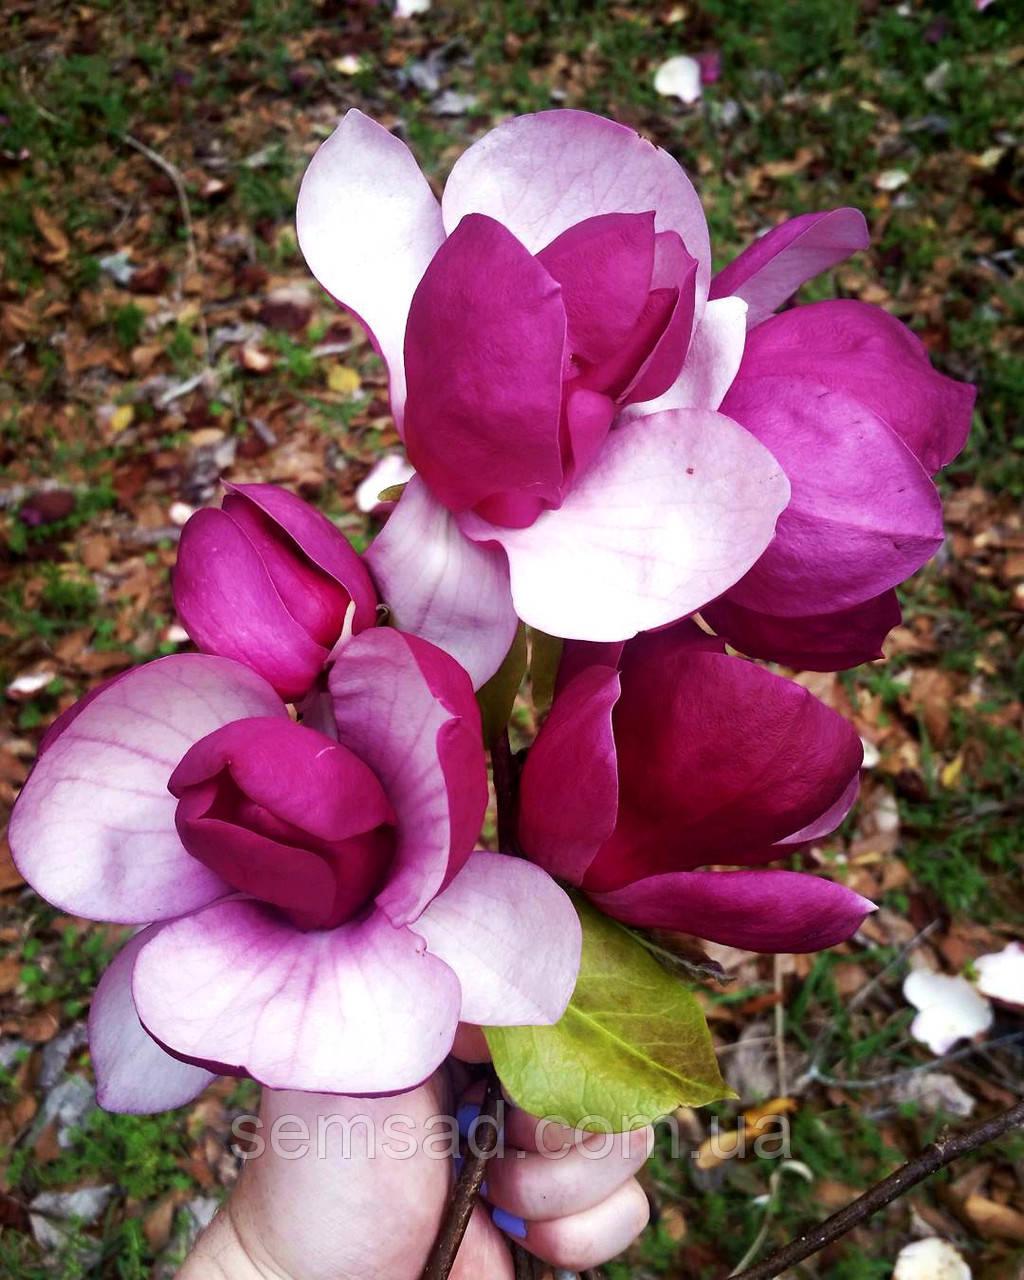 Магнолия суланжа Рустика Рубра \ Magnolia soulangiana 'Rustica Rubra' ( саженцы 2 года)